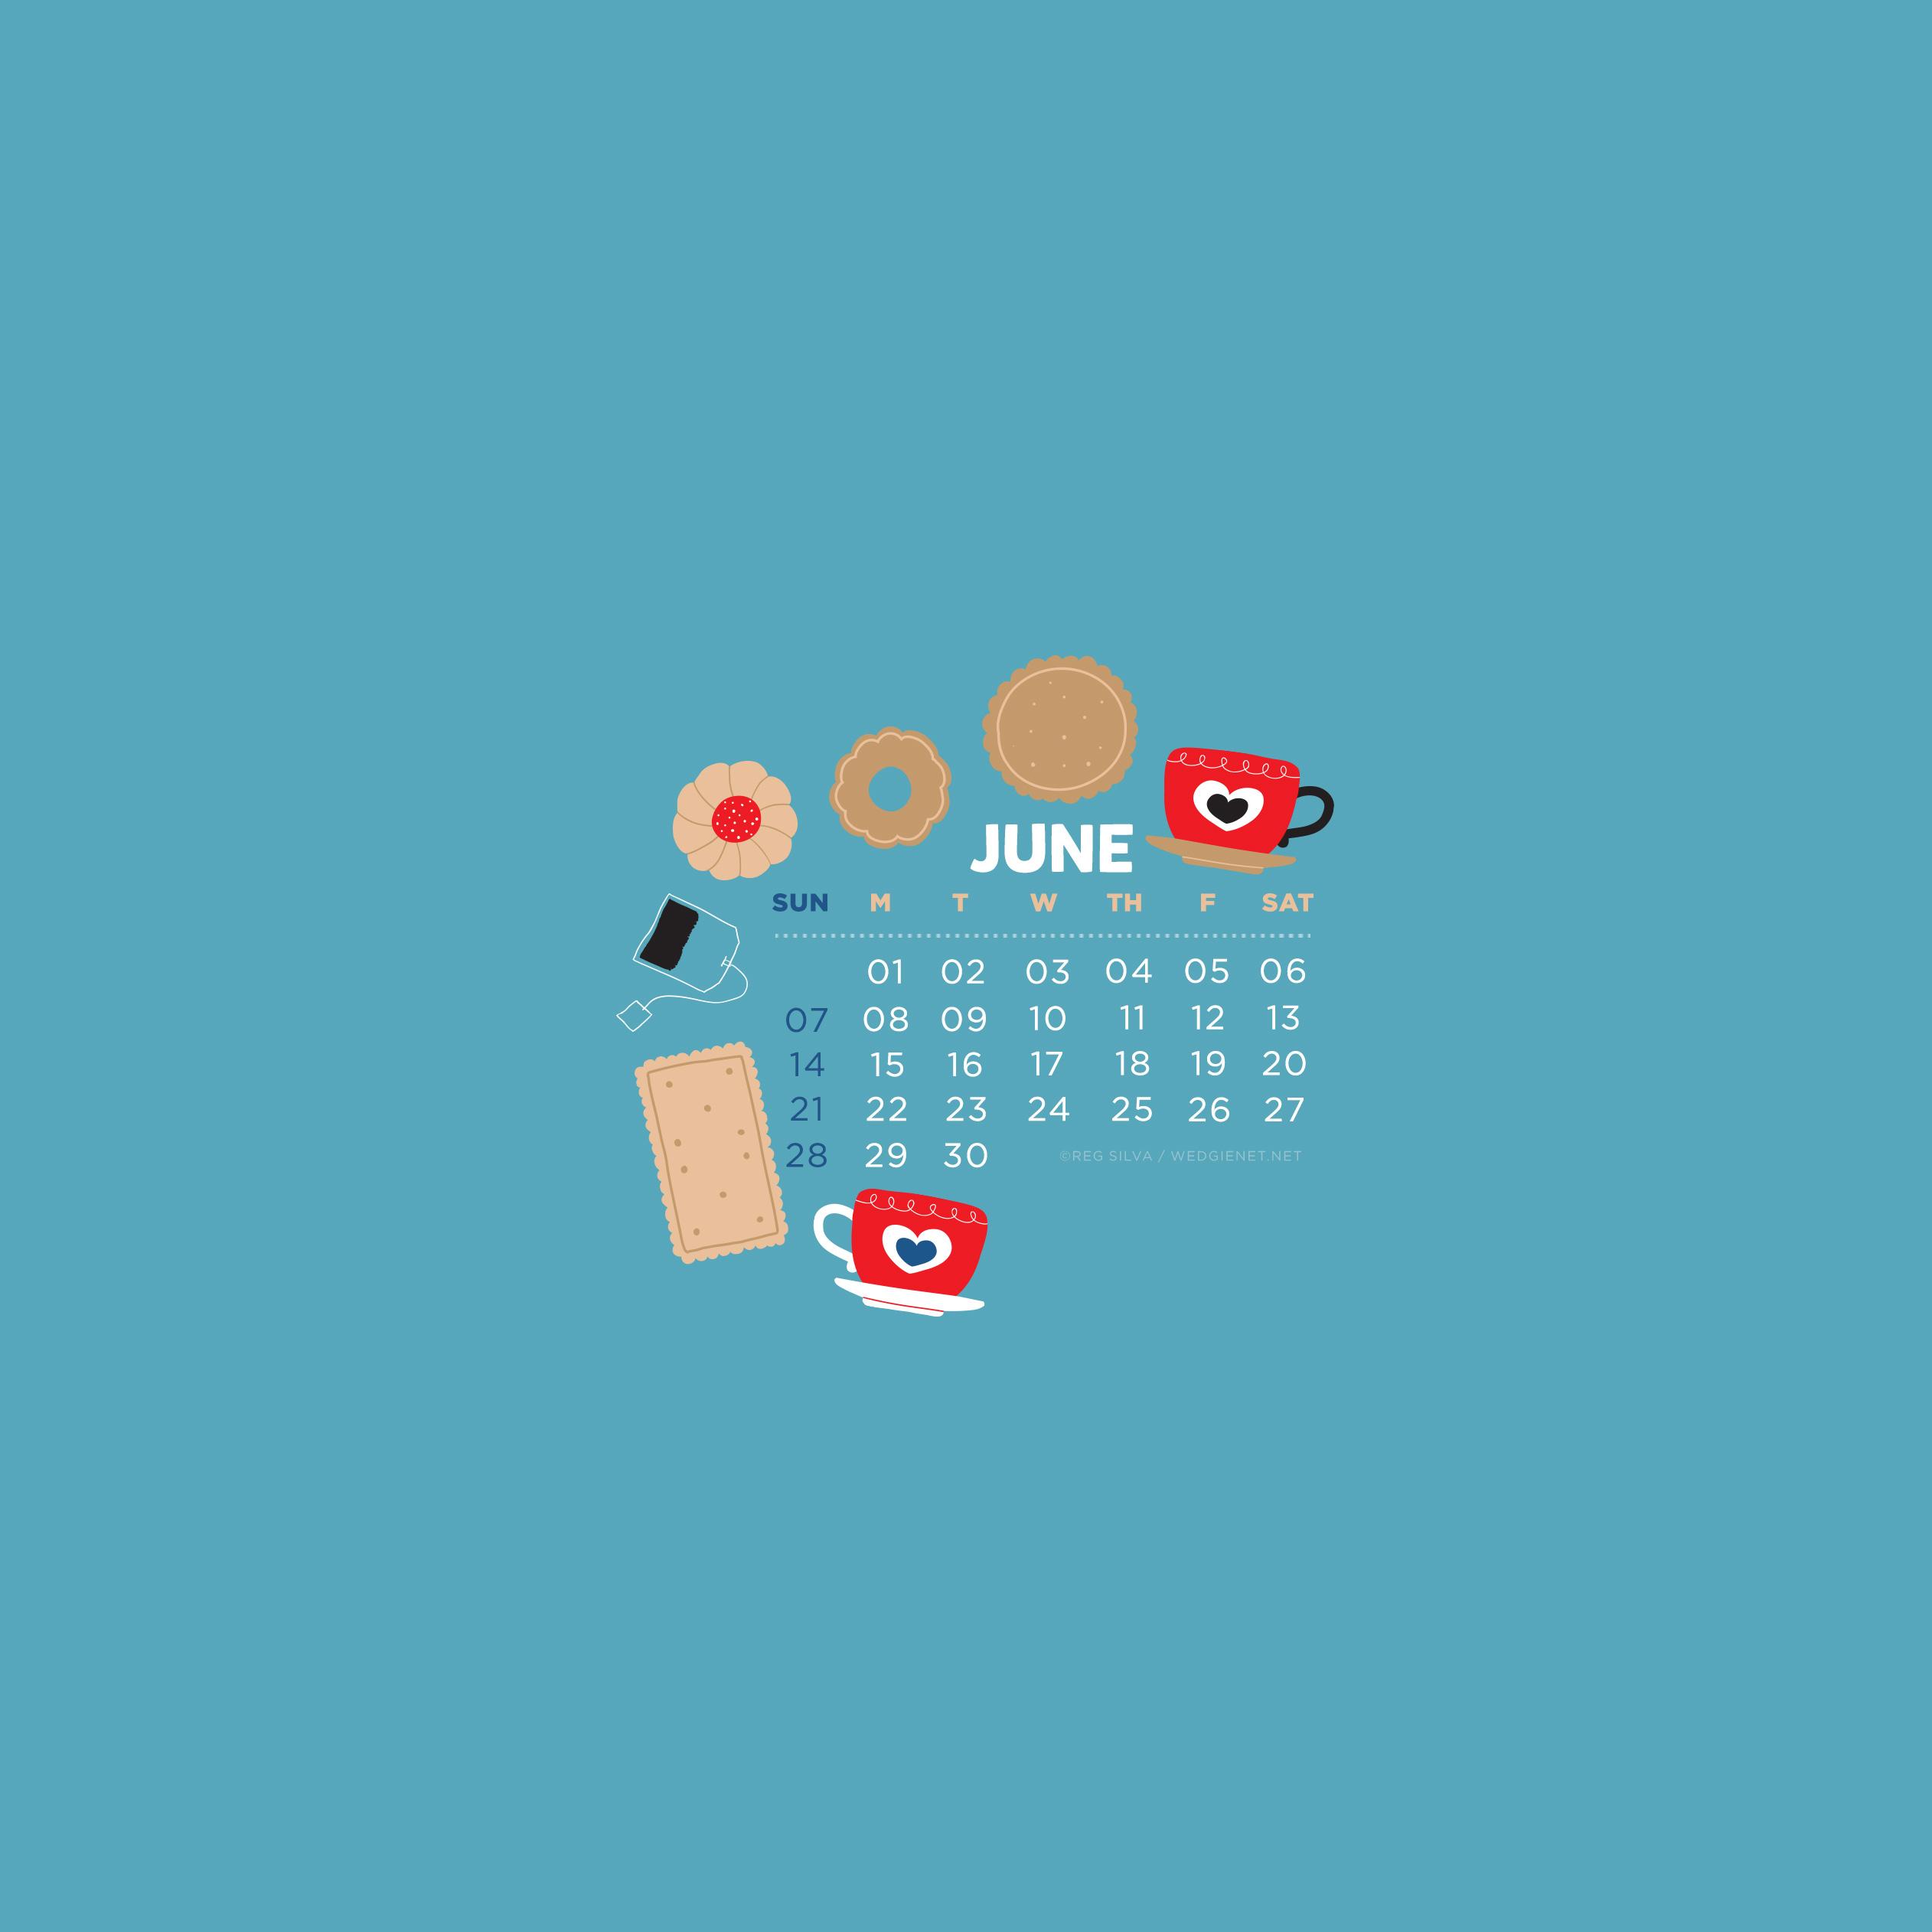 Free Download Desktop Iphone Ipad Lock Screen Calendar inside Calendar On Lock Screen Iphone